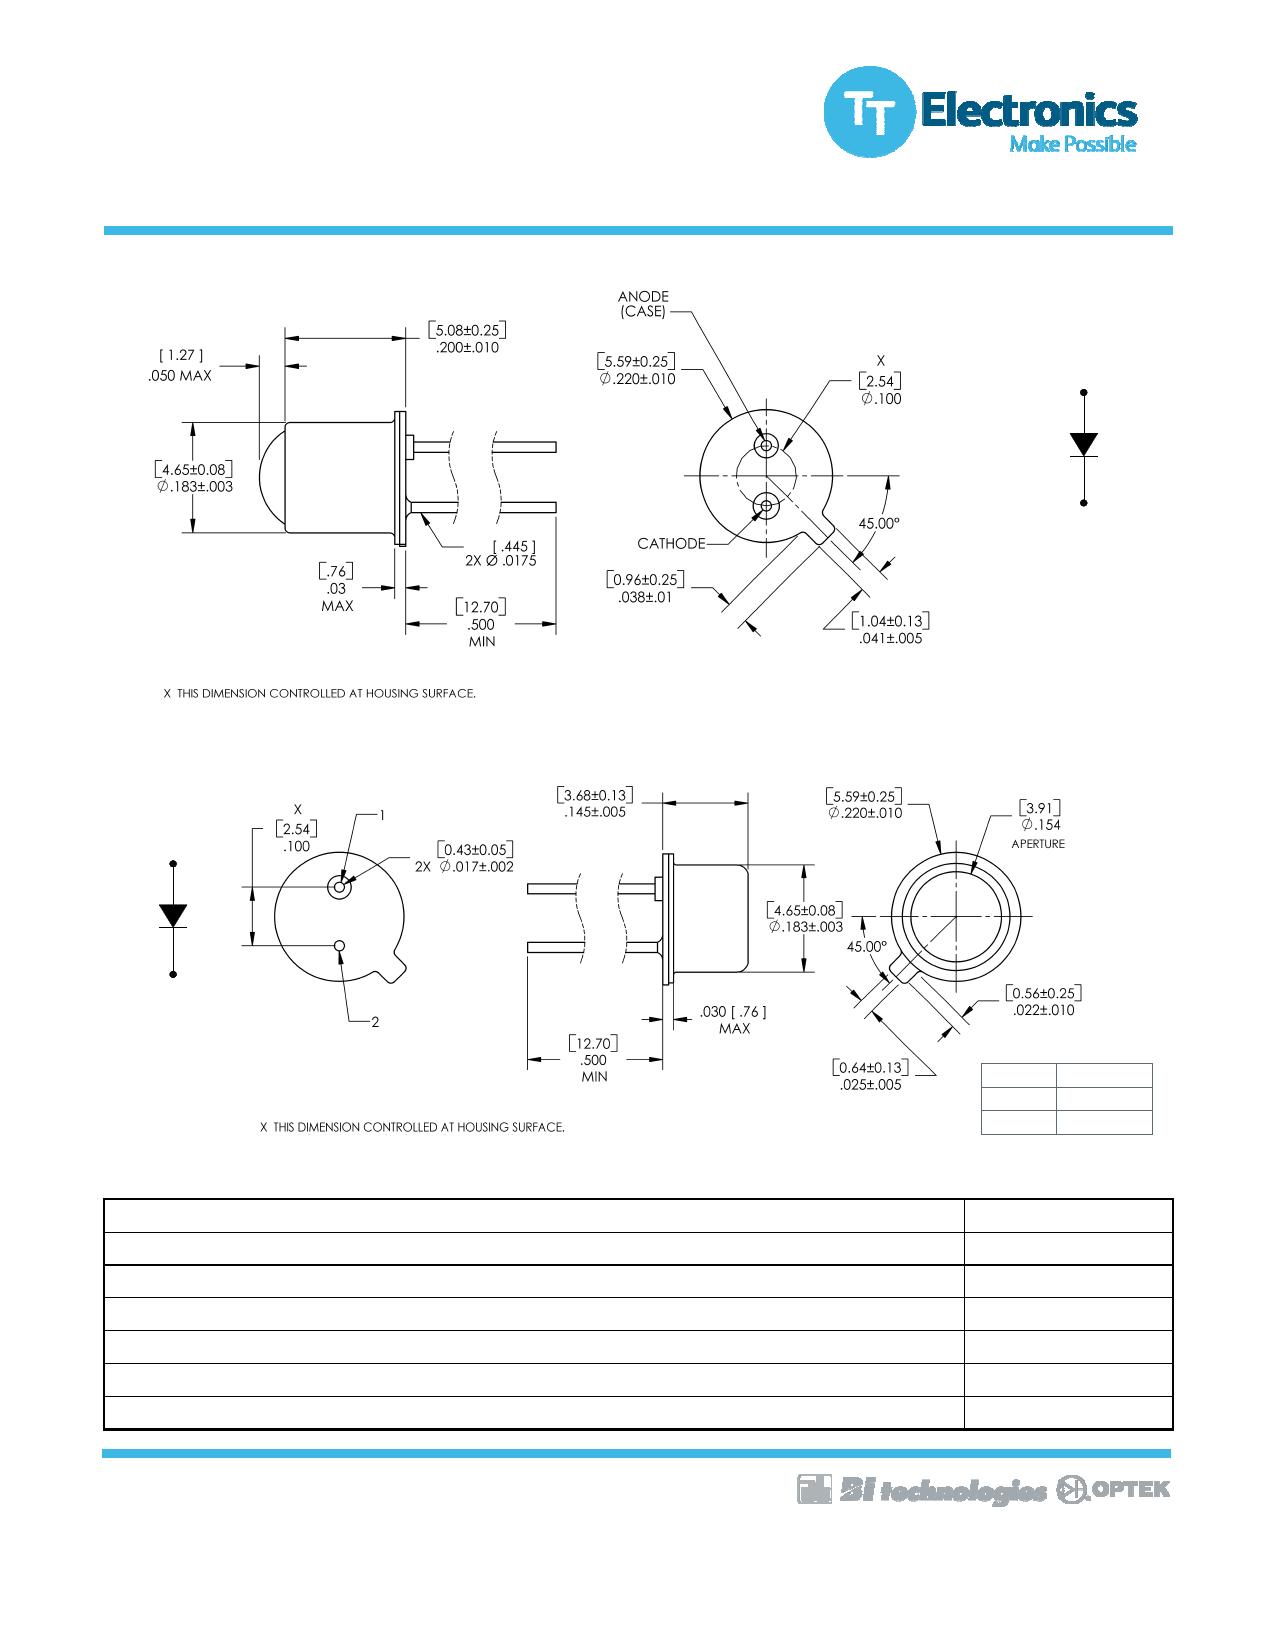 OP233 pdf, schematic